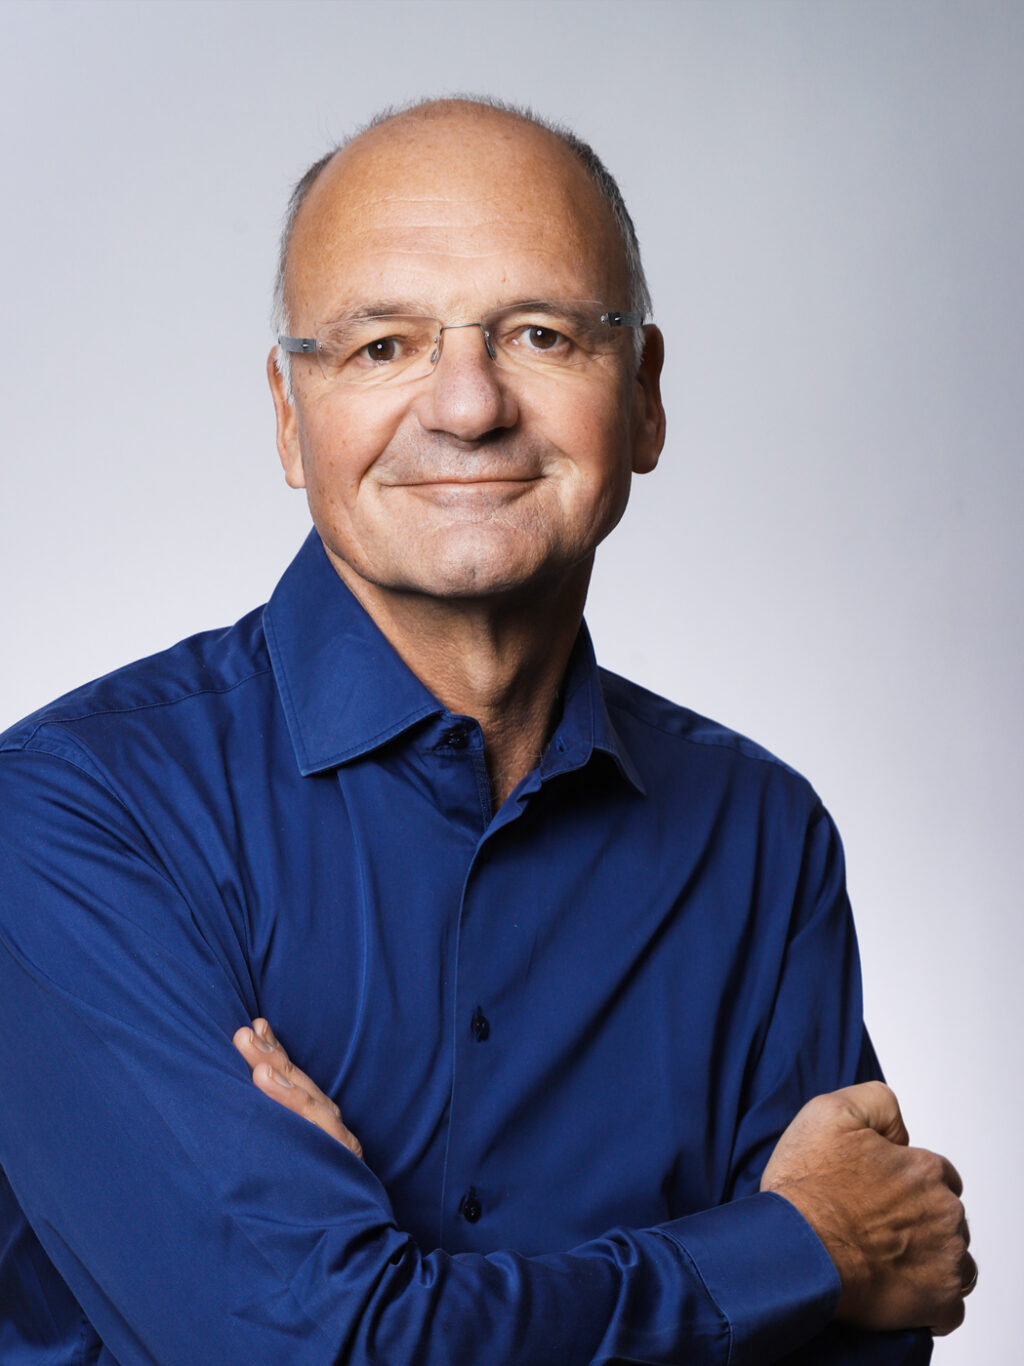 Walter Ströhm